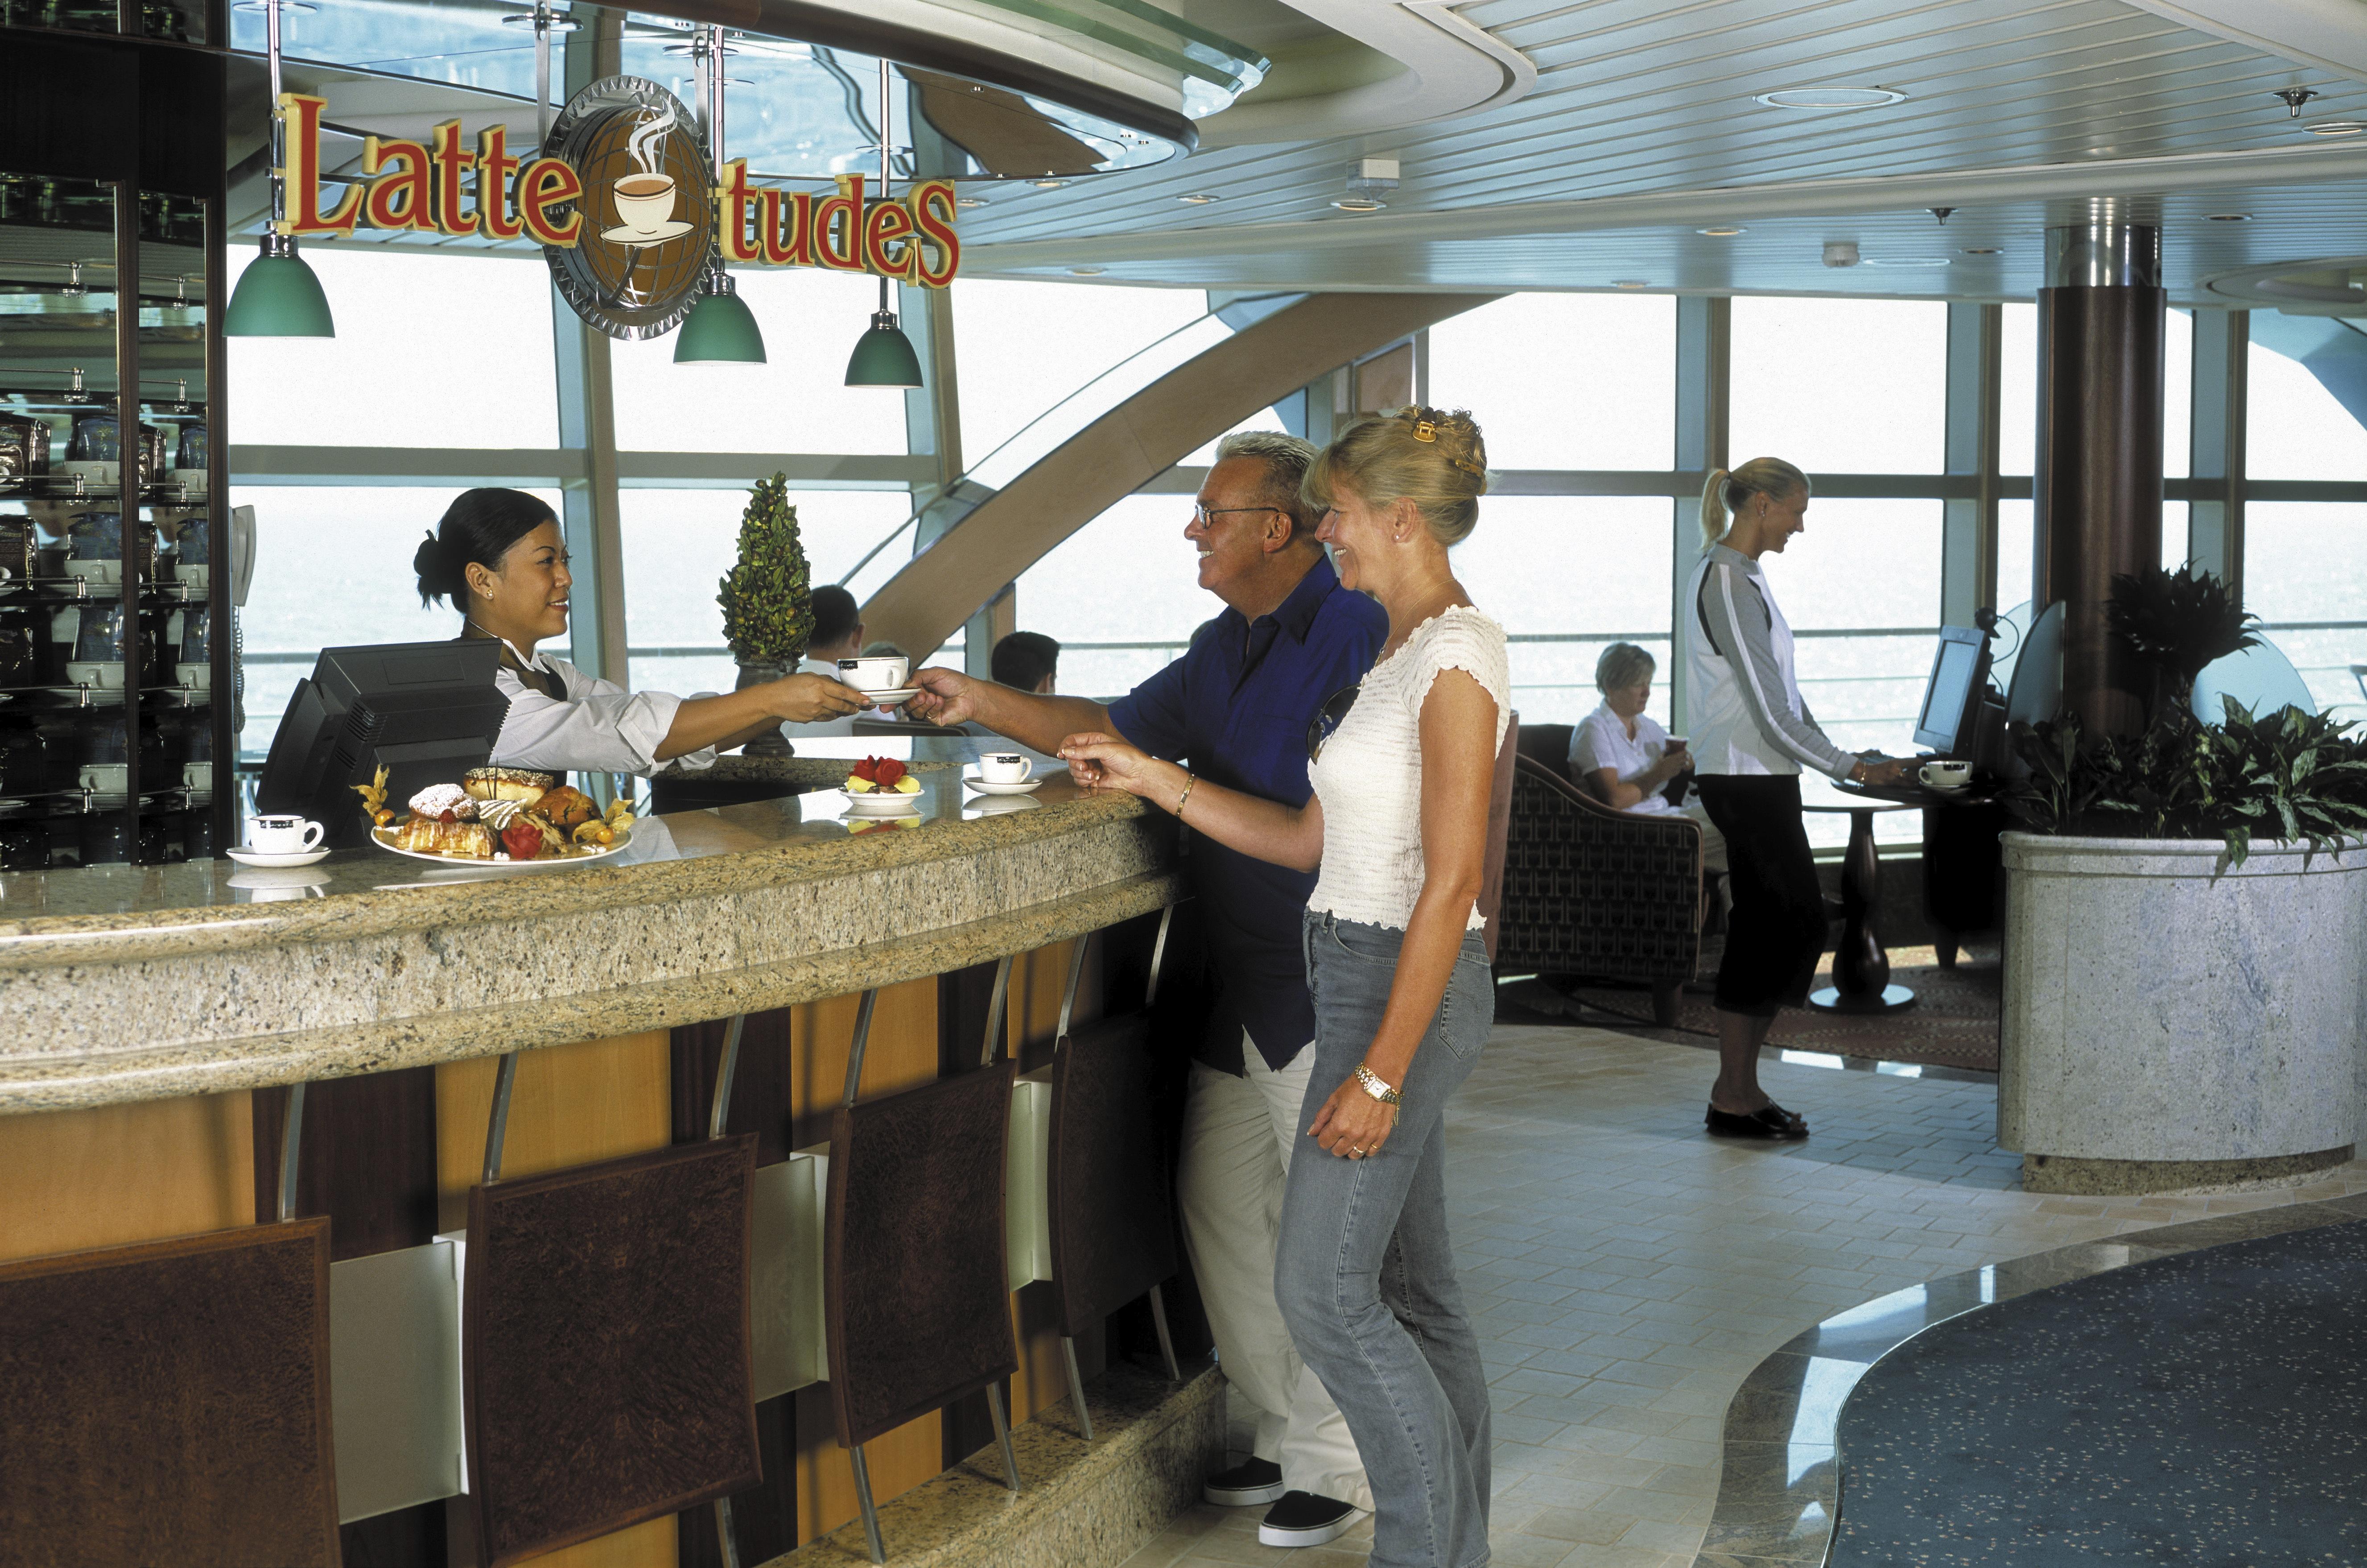 Royal Caribbean International Brilliance of the Seas Interior LatteTudes.jpeg